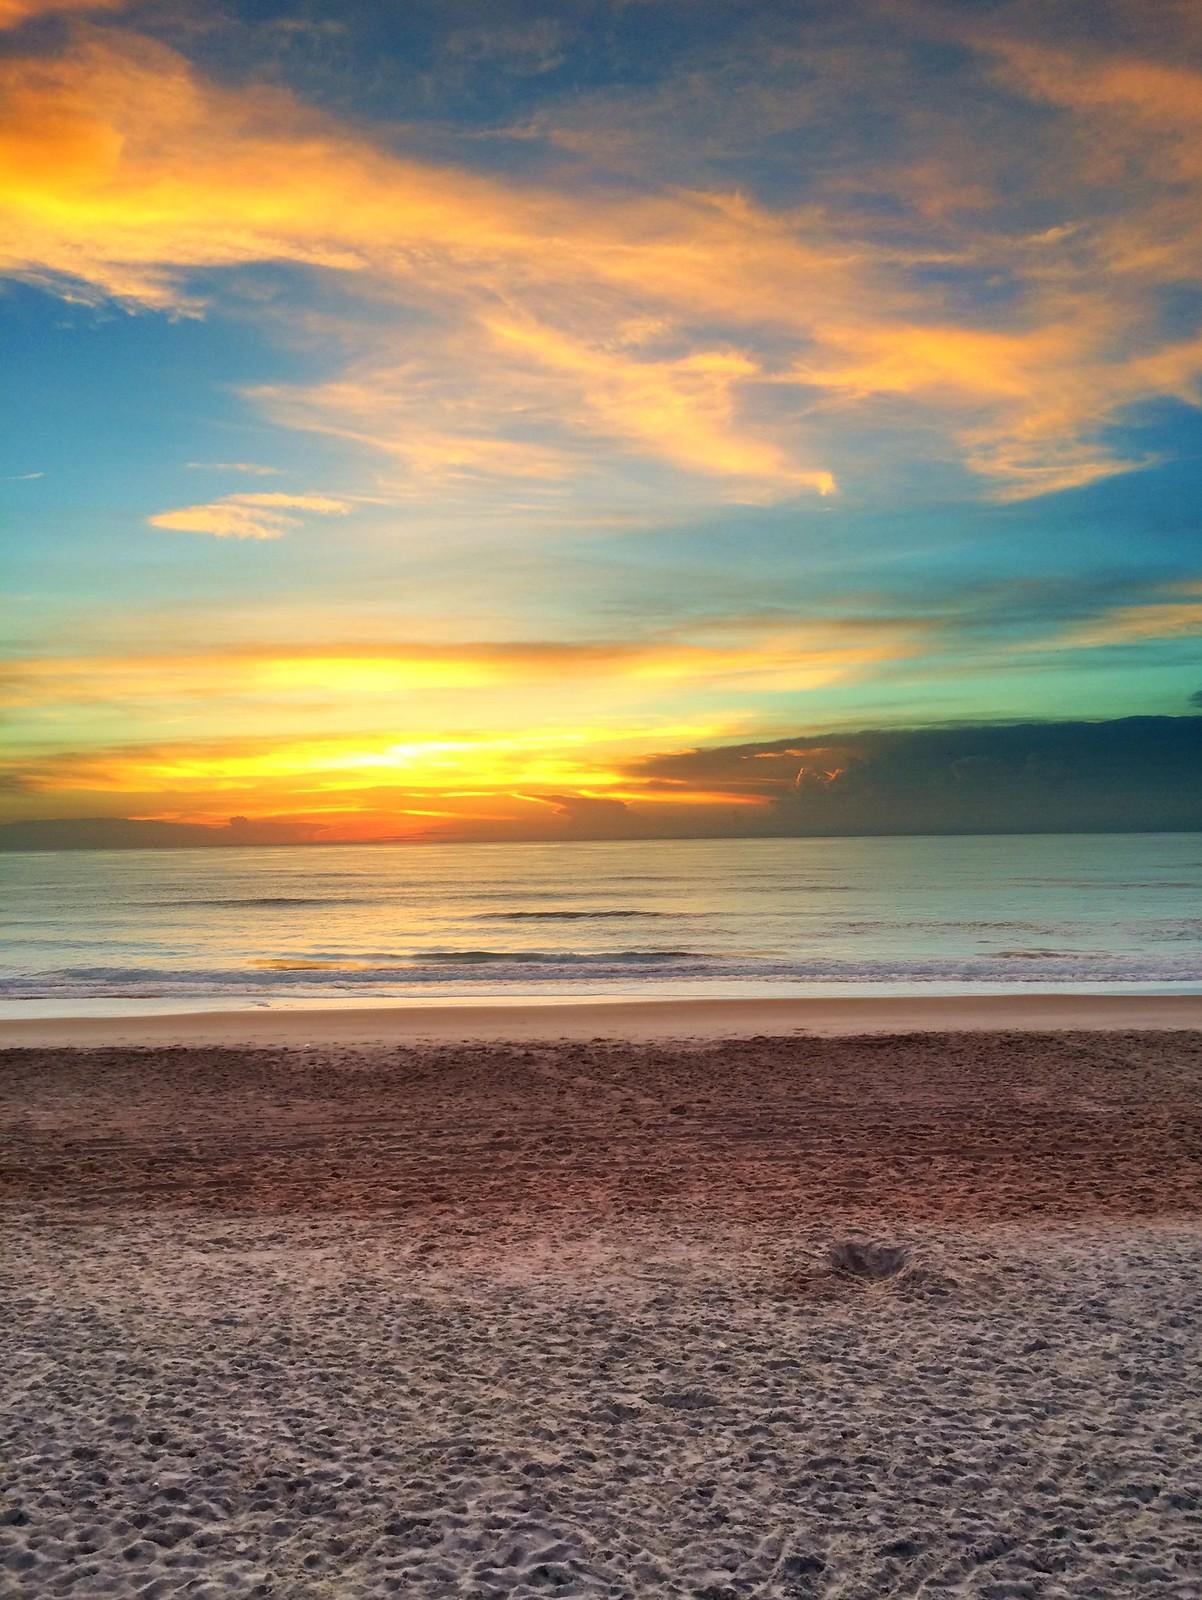 Atlantic Sunrise (Ormond Beach, FL)